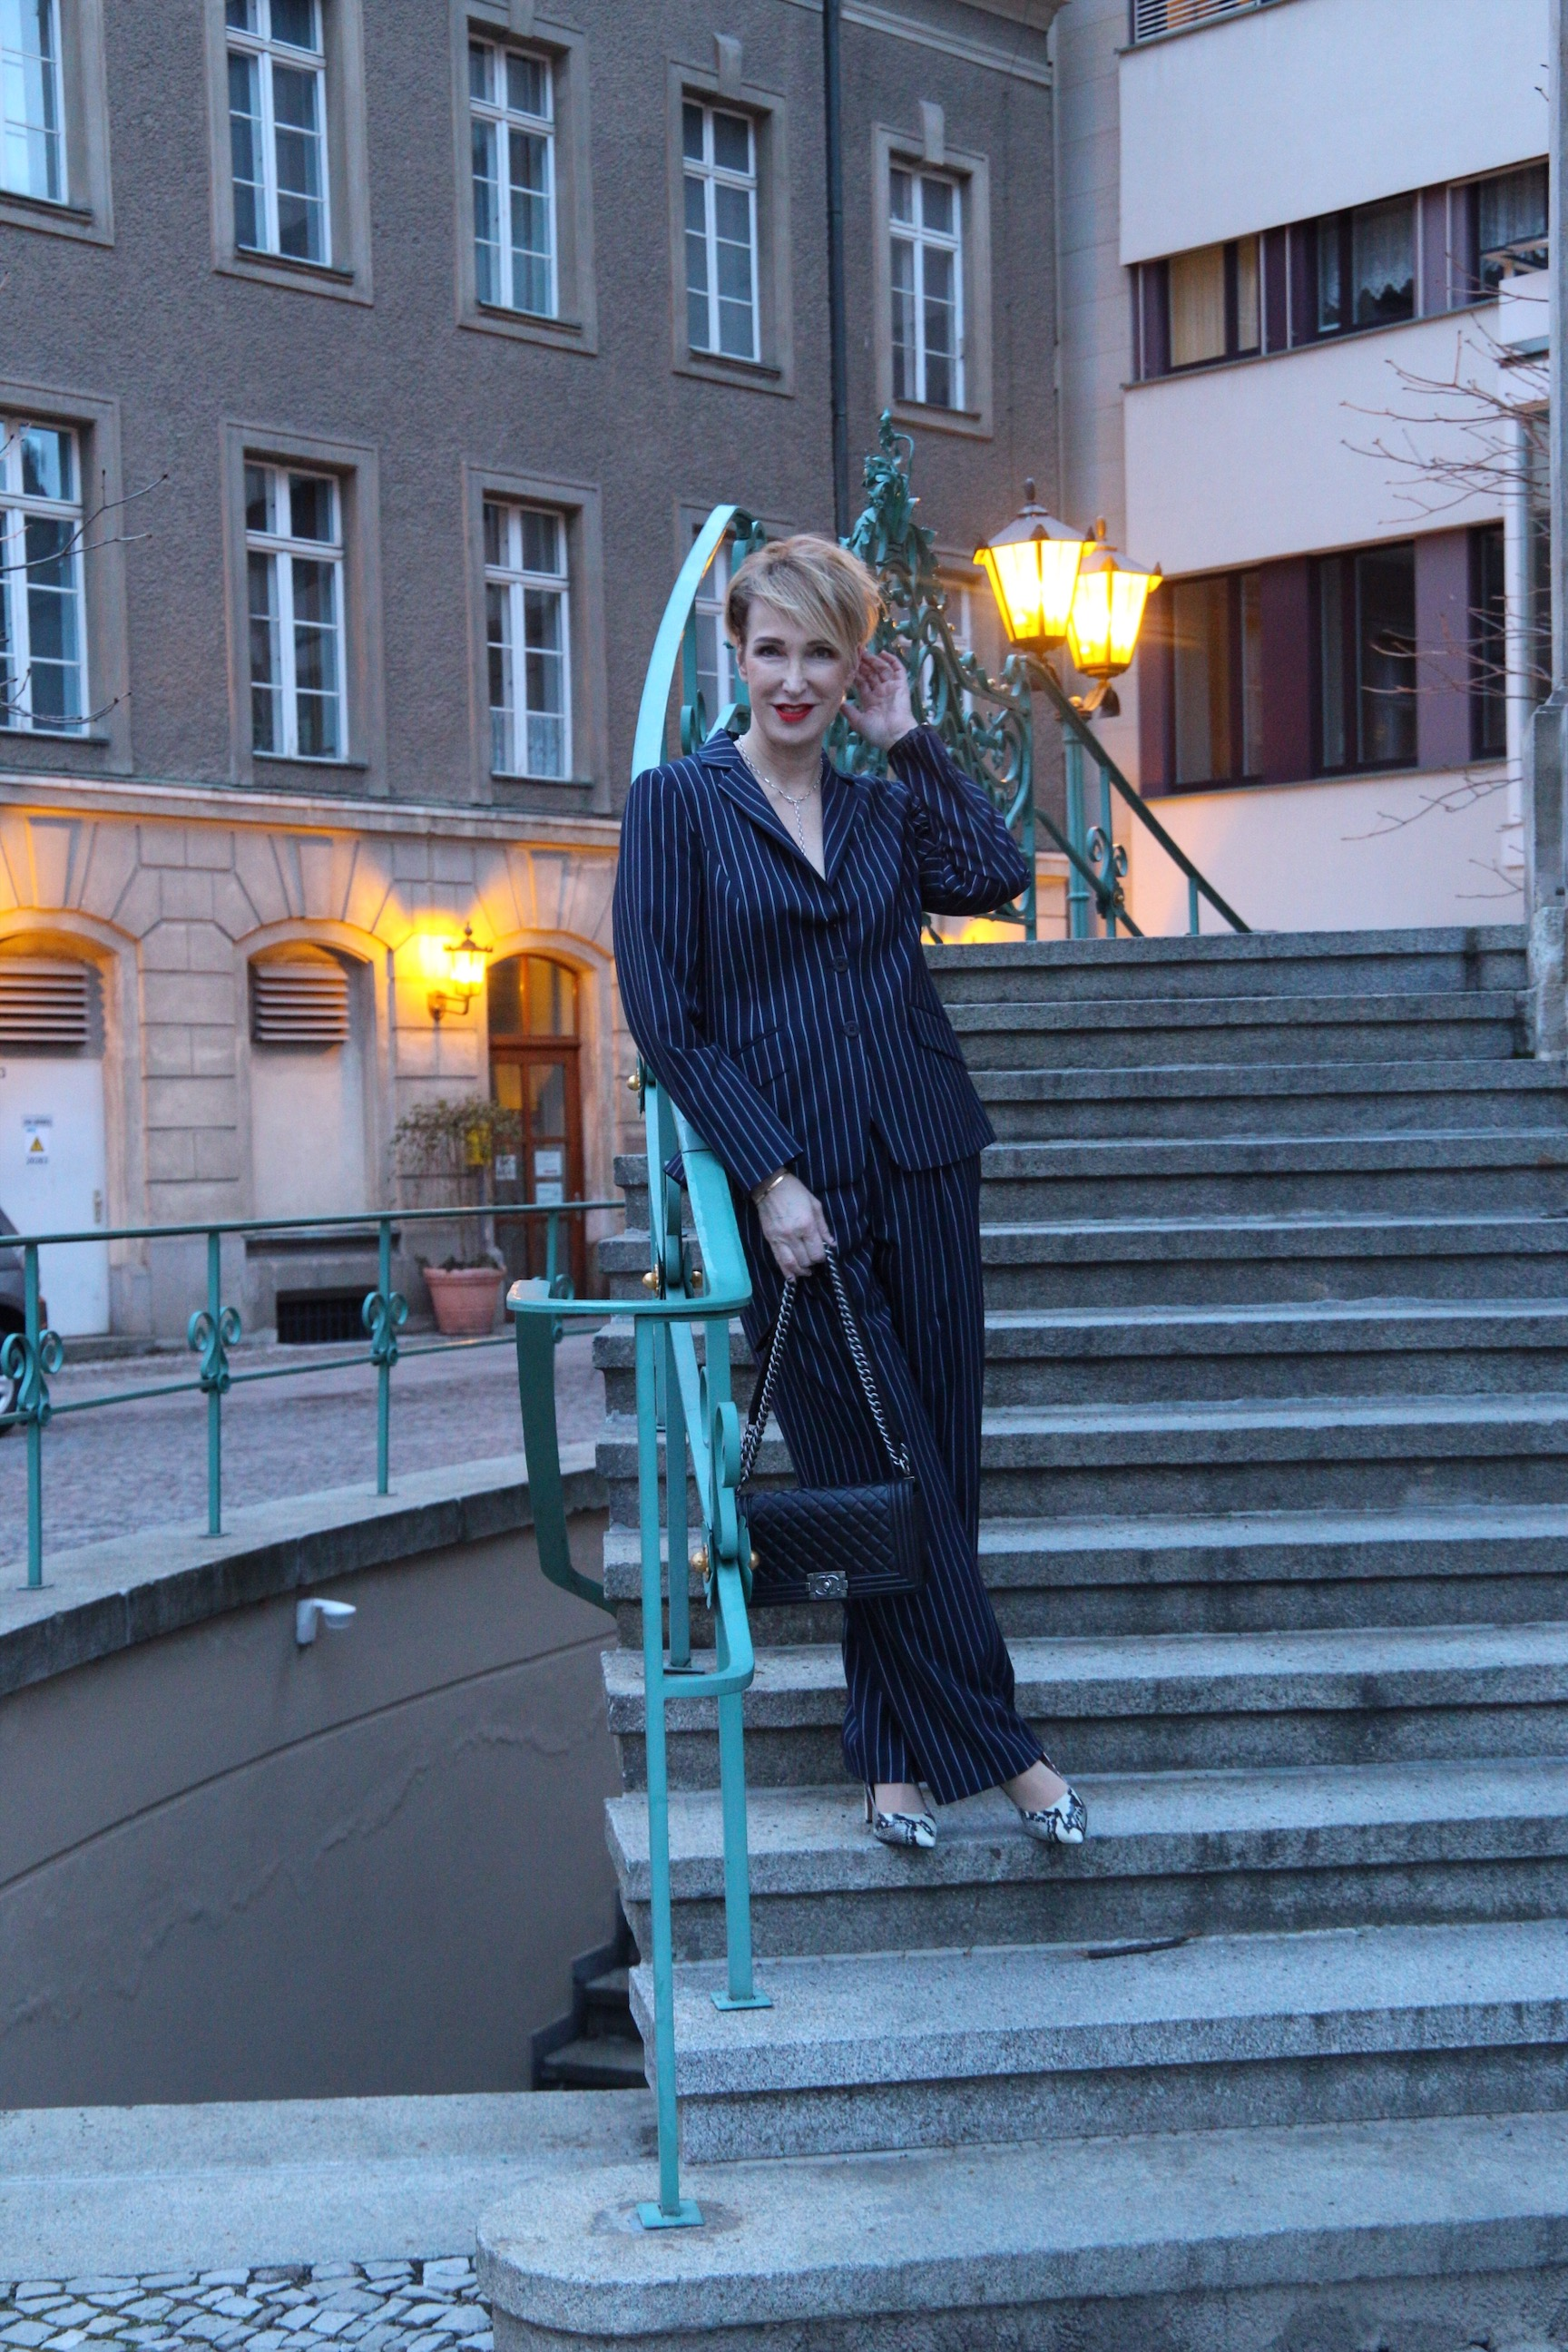 glamupyourlifestyle Nadelstreifen Hosenanzug Nadelstreifenanzug Damenanzug Berlinale-2019 Ü-40-Blog ue-50-Blog ue-40-Blog ü-50-blog